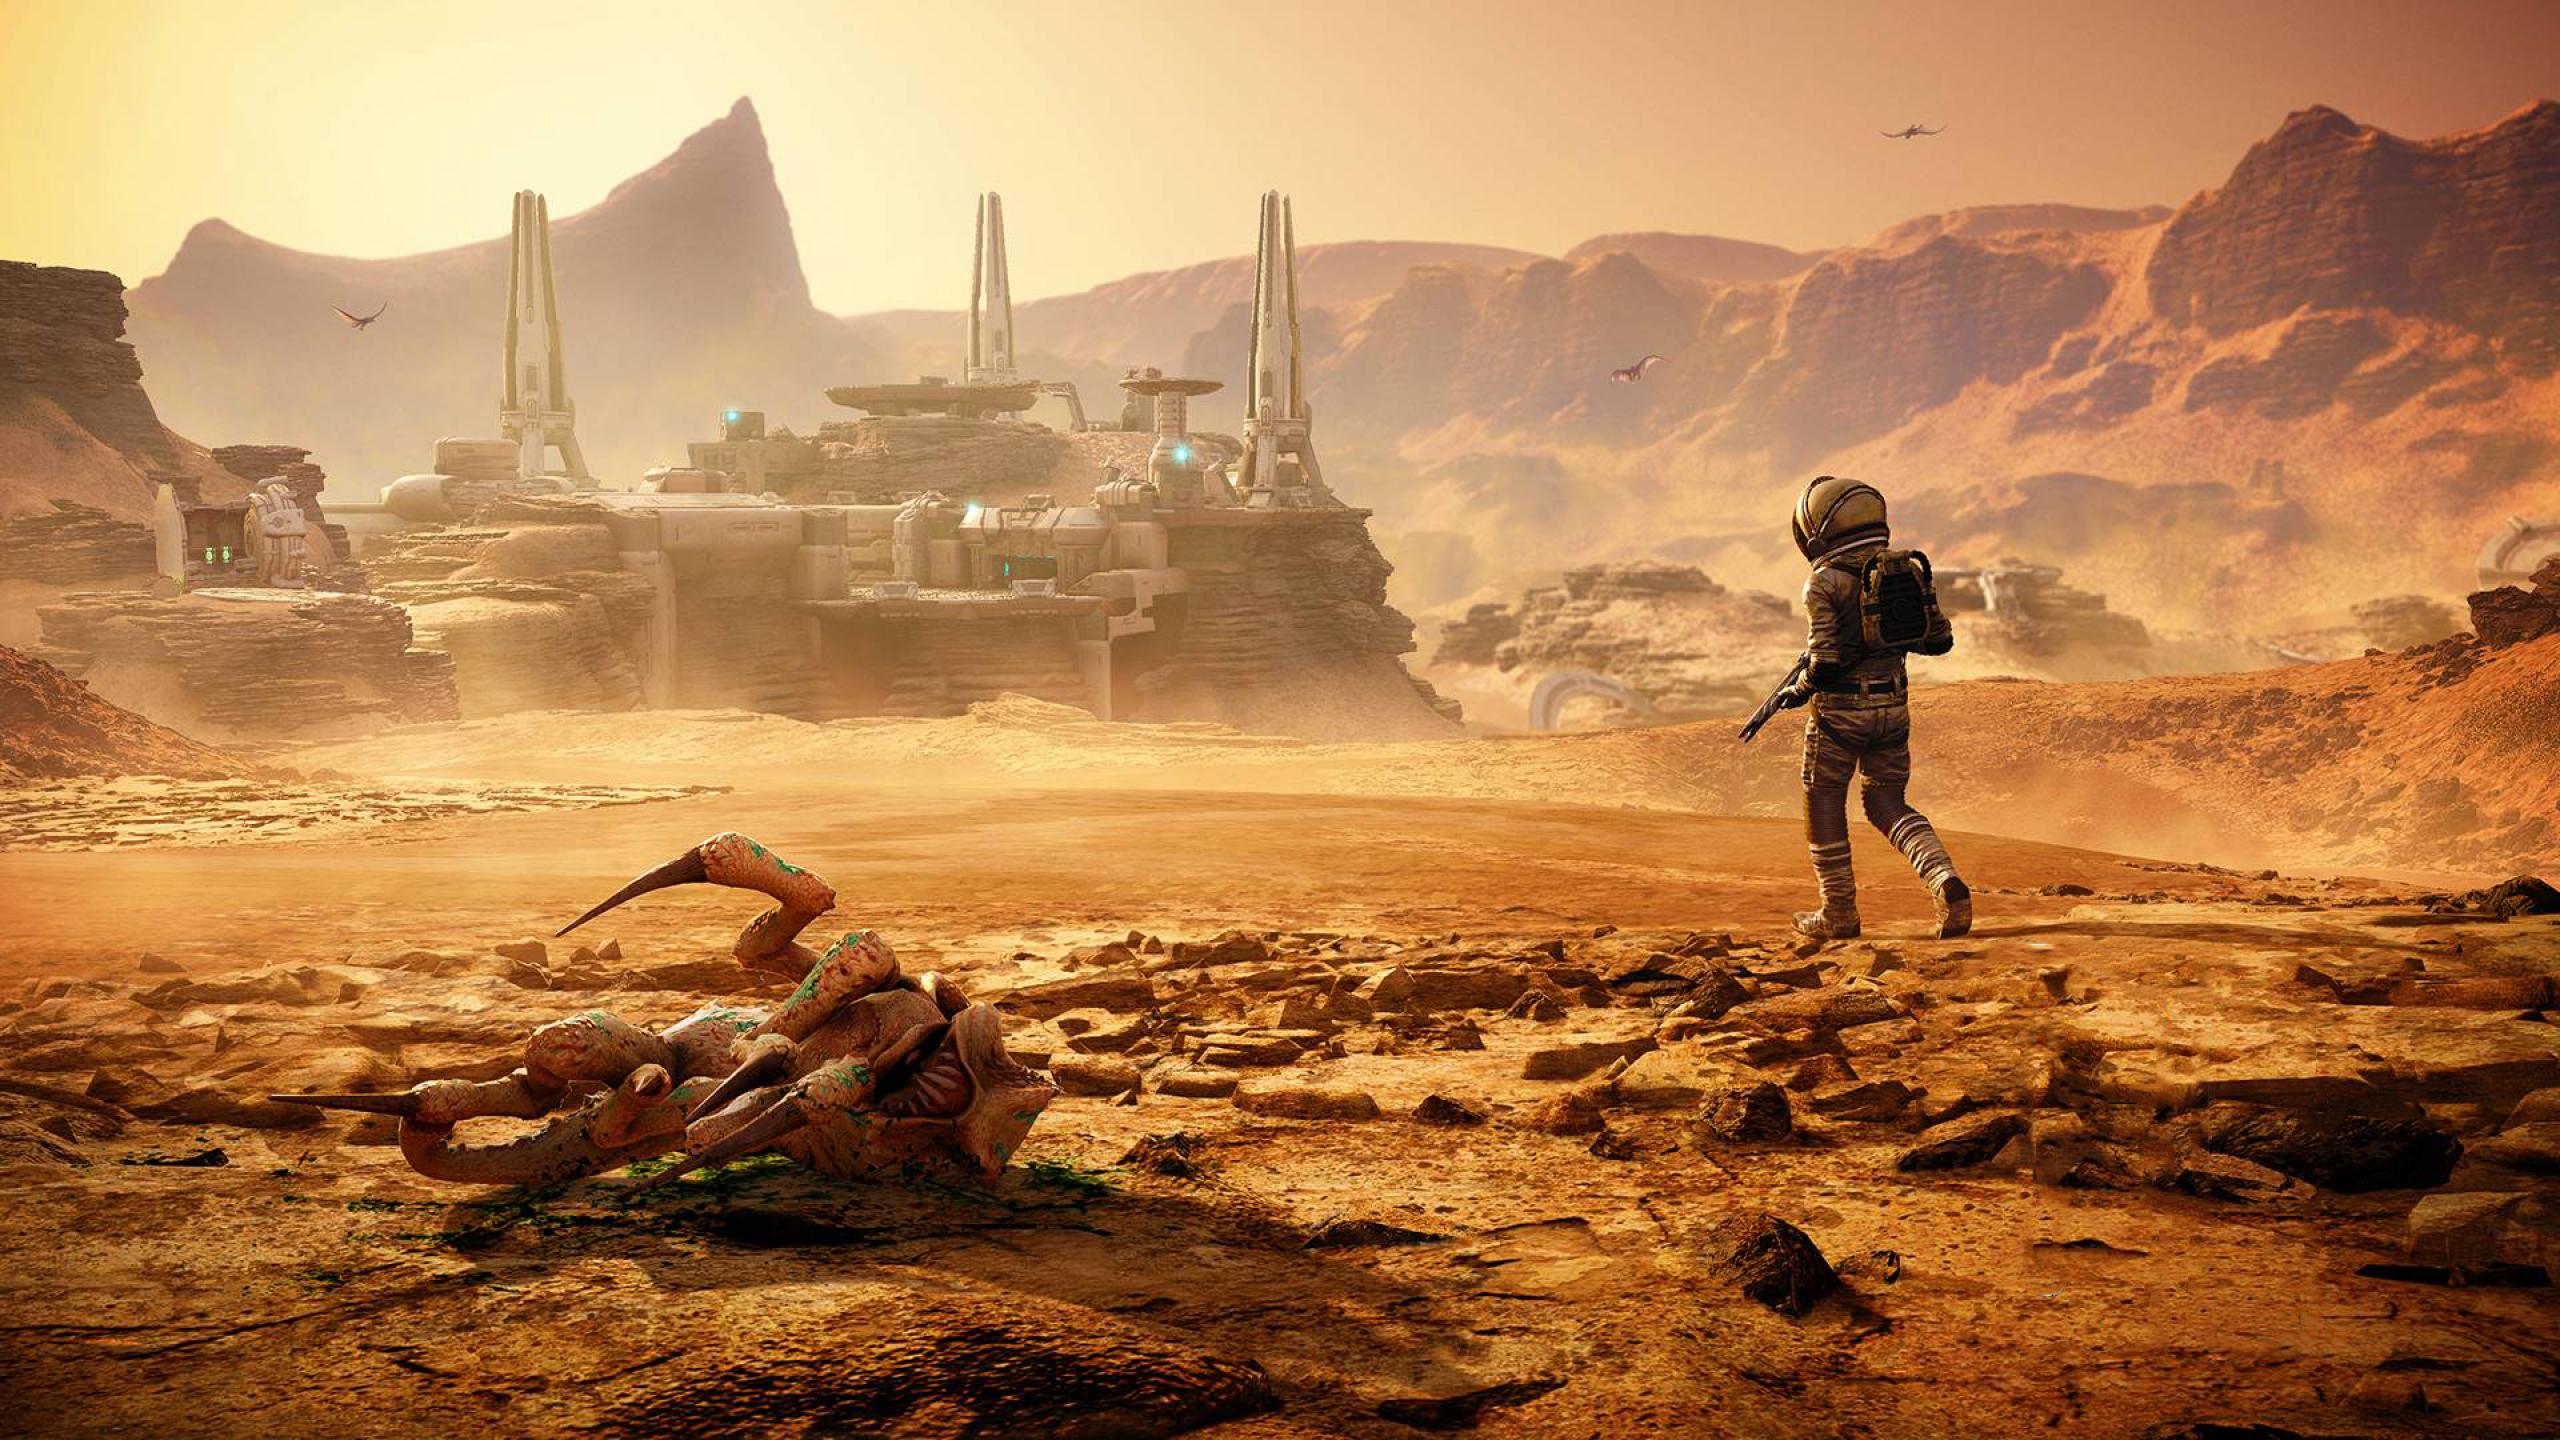 2560x1440 Far Cry 5 Mars 1440p Resolution Wallpaper Hd Games 4k